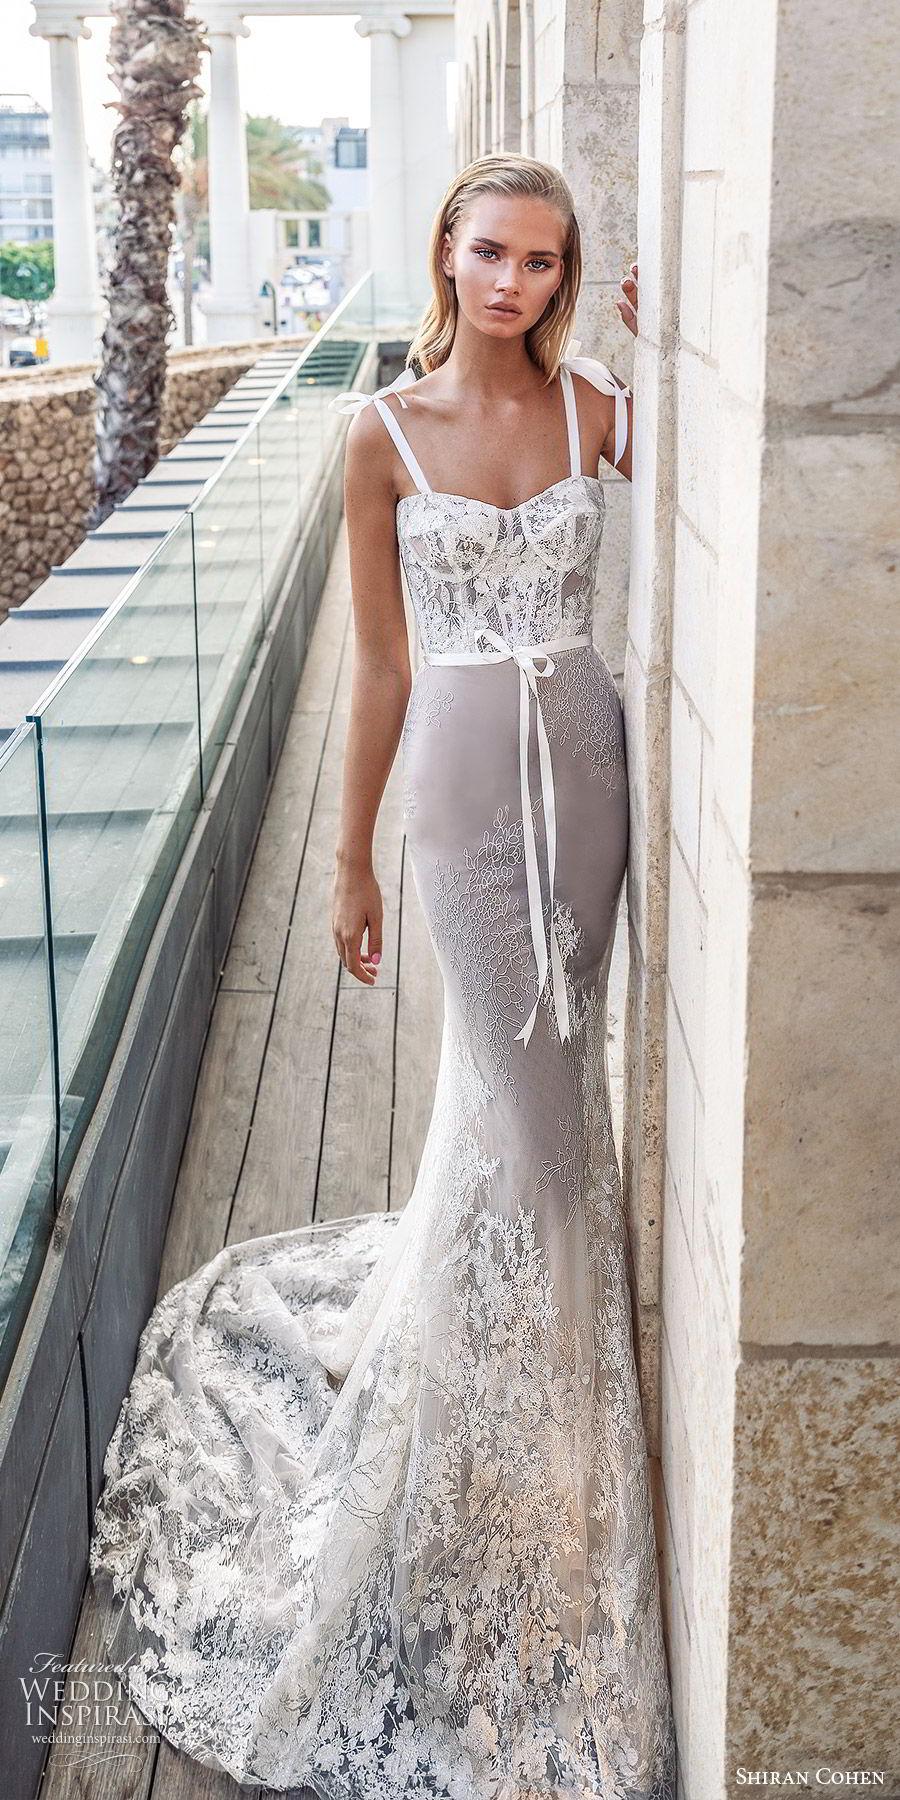 shiran cohen 2019 bridal sleeveless thick straps semi sweetheart neckline corset lace bodice sheath mermaid wedding dress chapel train romantic elegant (2) mv